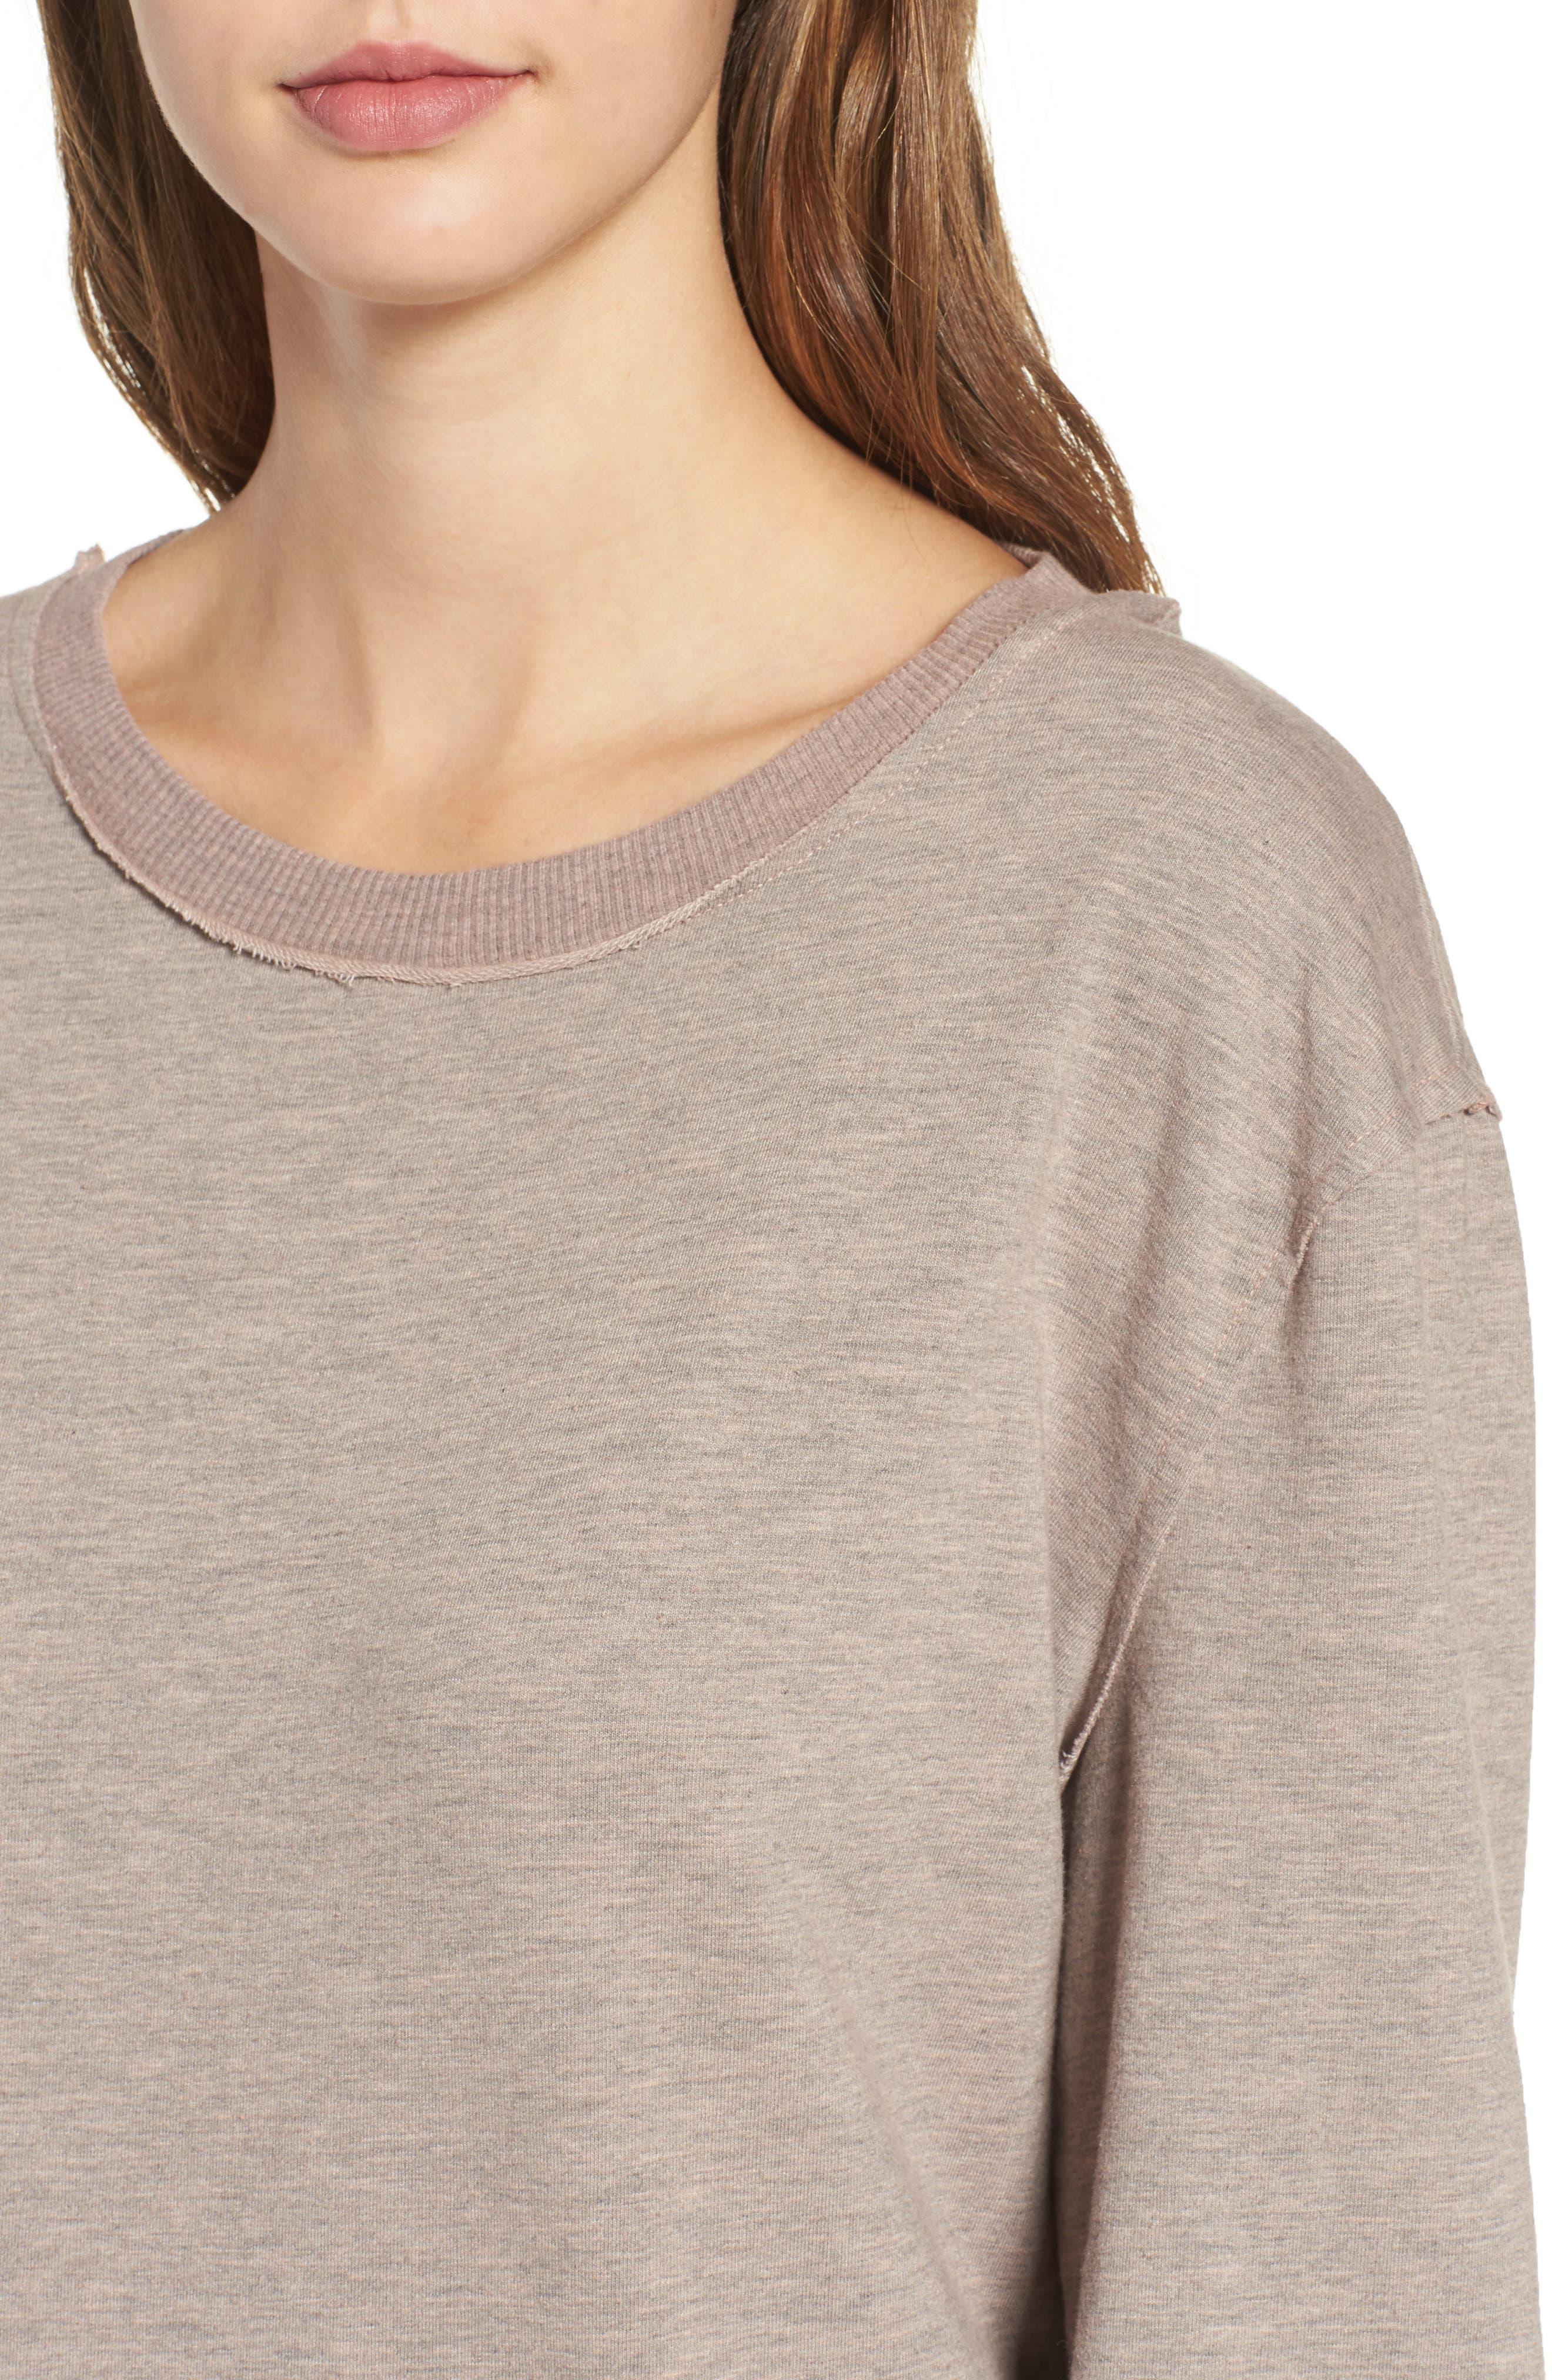 Low Back Sweatshirt Dress,                             Alternate thumbnail 4, color,                             650